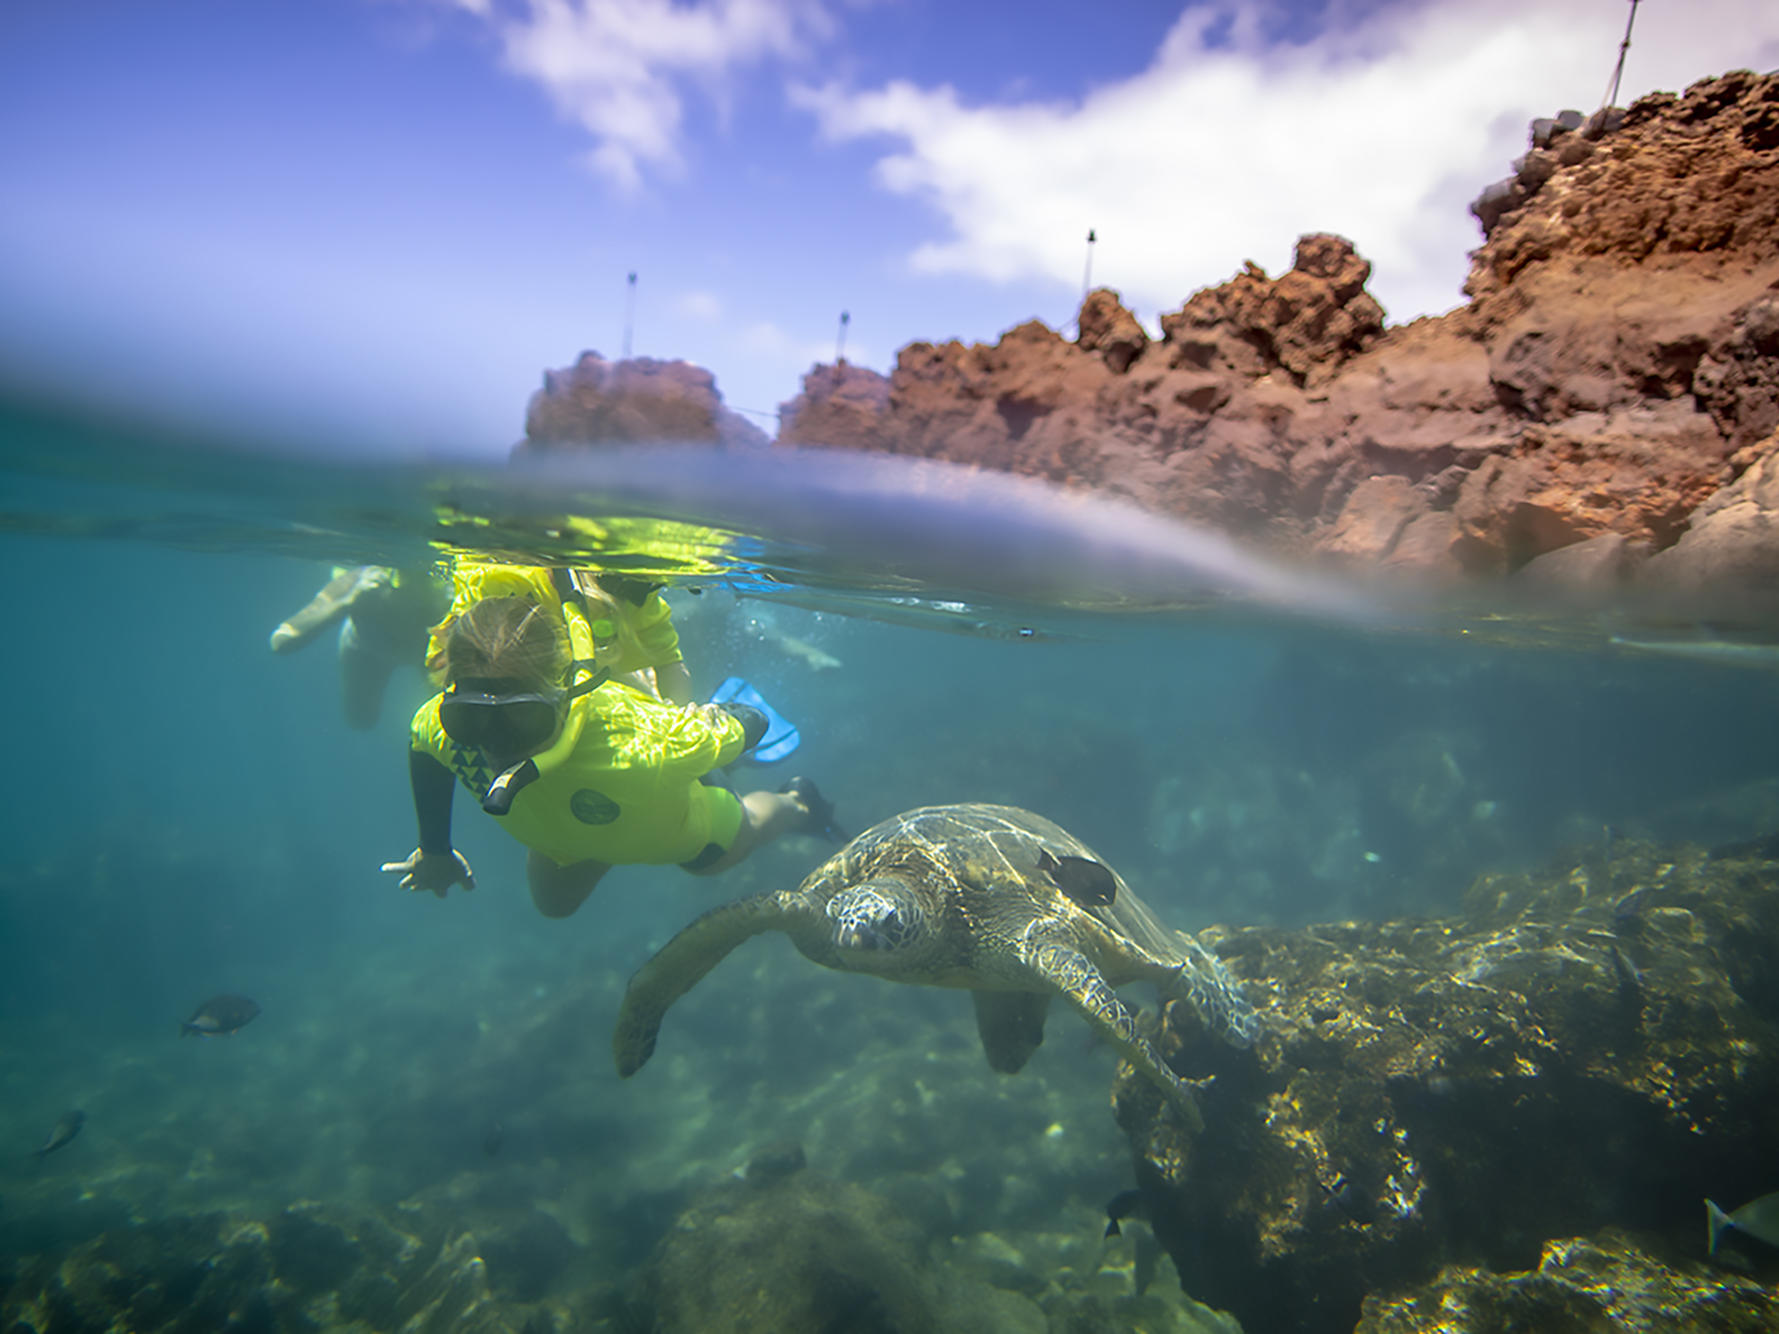 kid snorkeling next to sea turtle